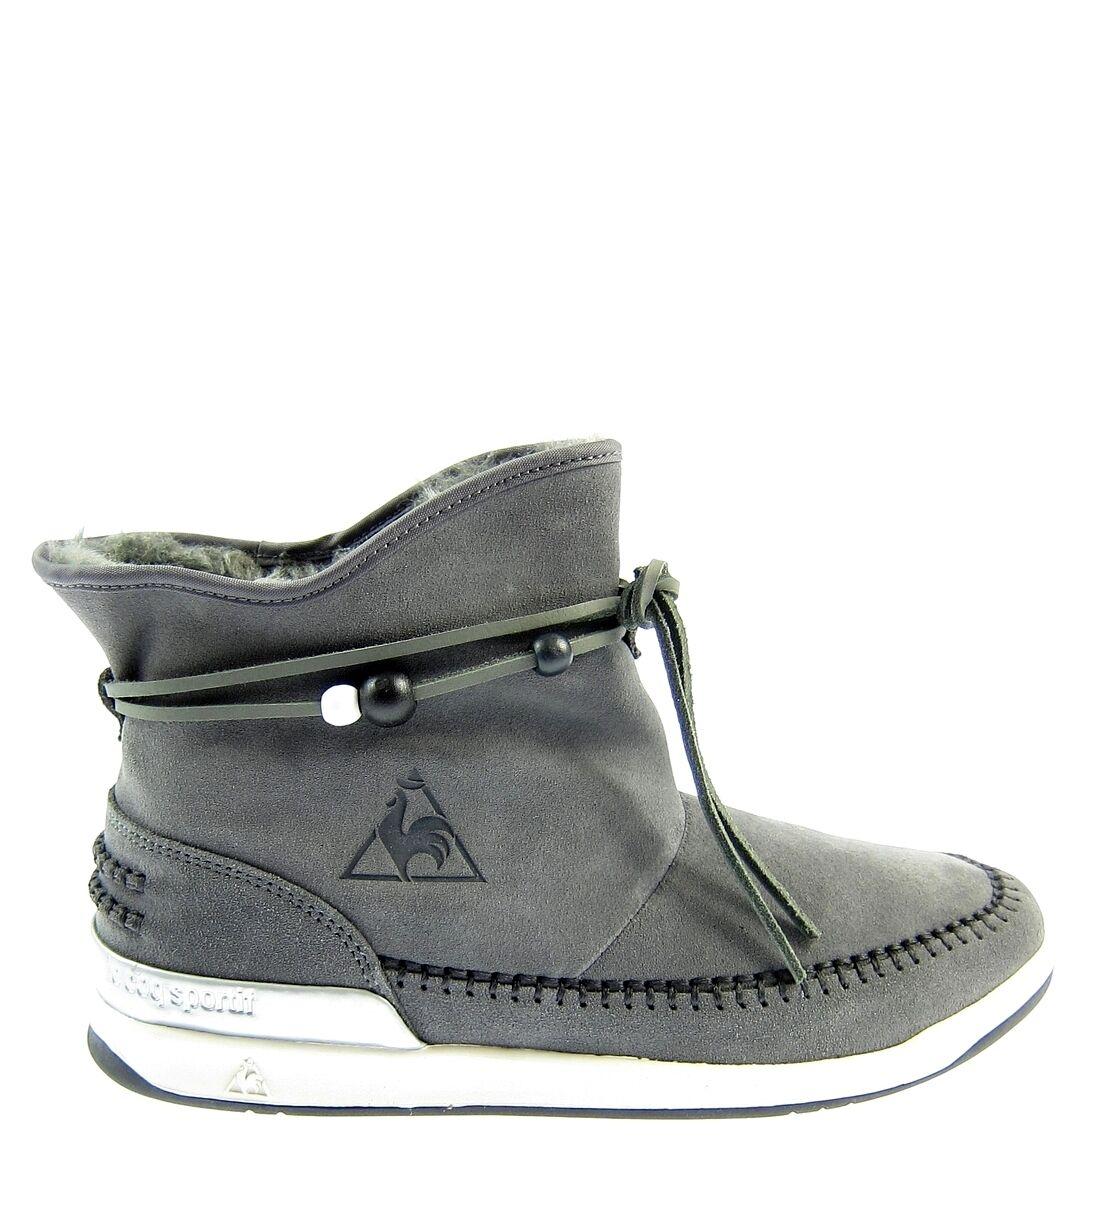 LE COQ SPORTIF Damen,Damens,Stiefeletten,Schlupf,Schuhe,Schuhes,Warm,Leder,Grau,NEU Günstige und gute Schuhe